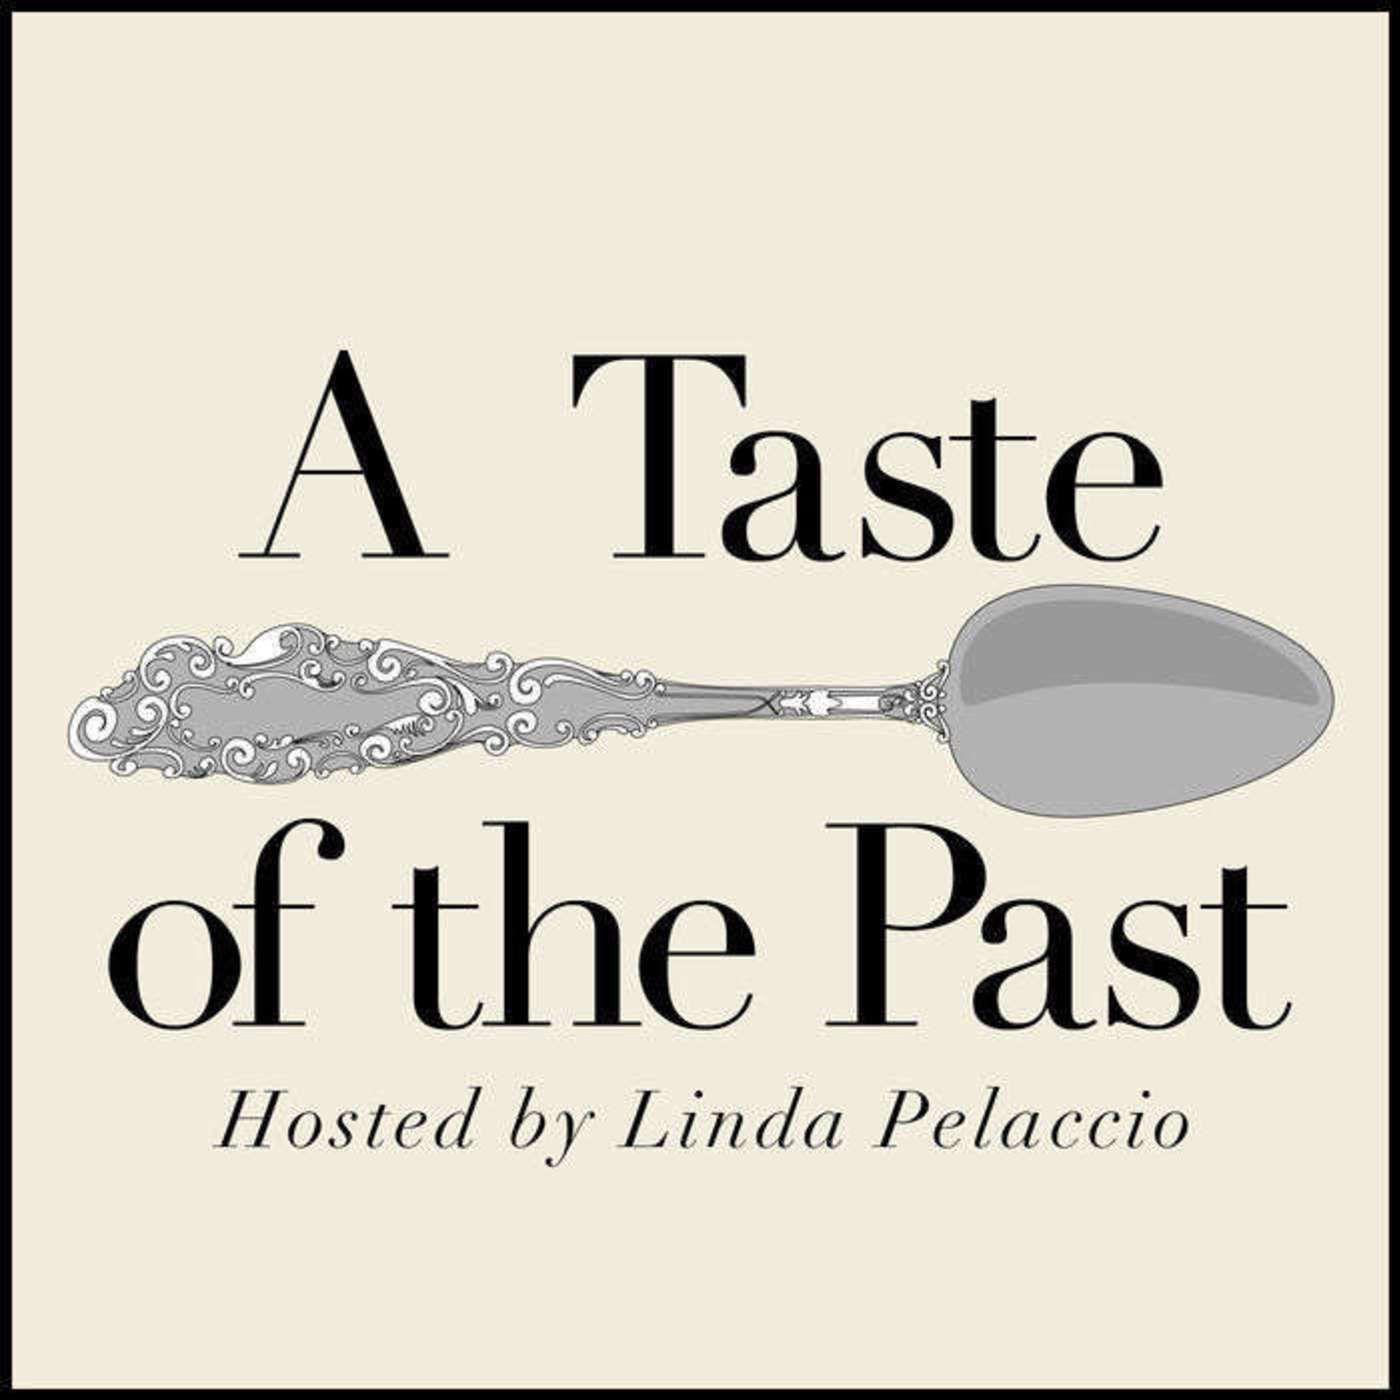 Episode 41: Potato Latkes and the Food of Hanukkah